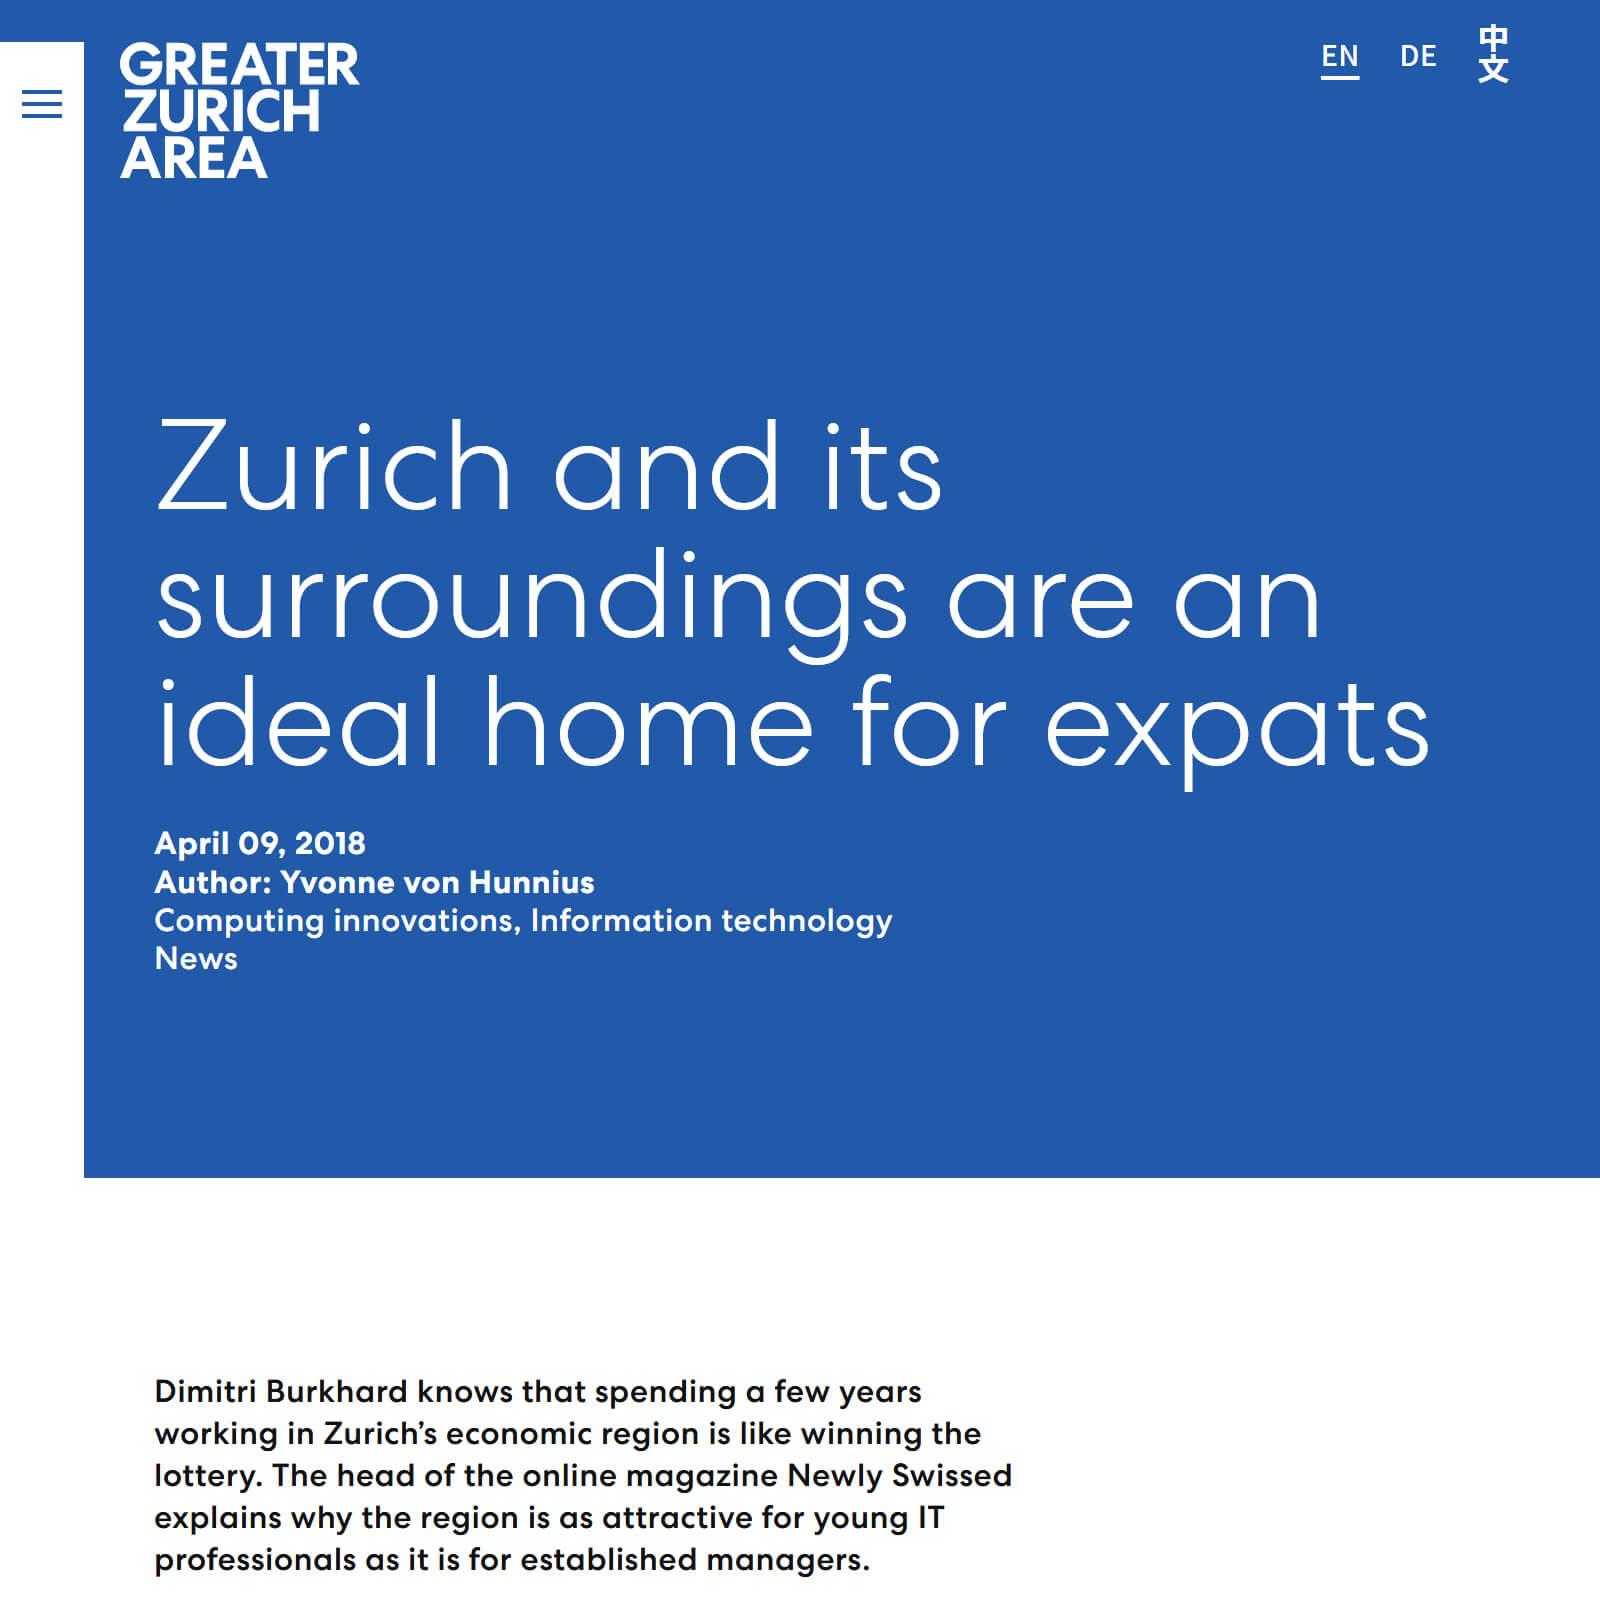 Greater Zurich Area - Dimitri Burkhard